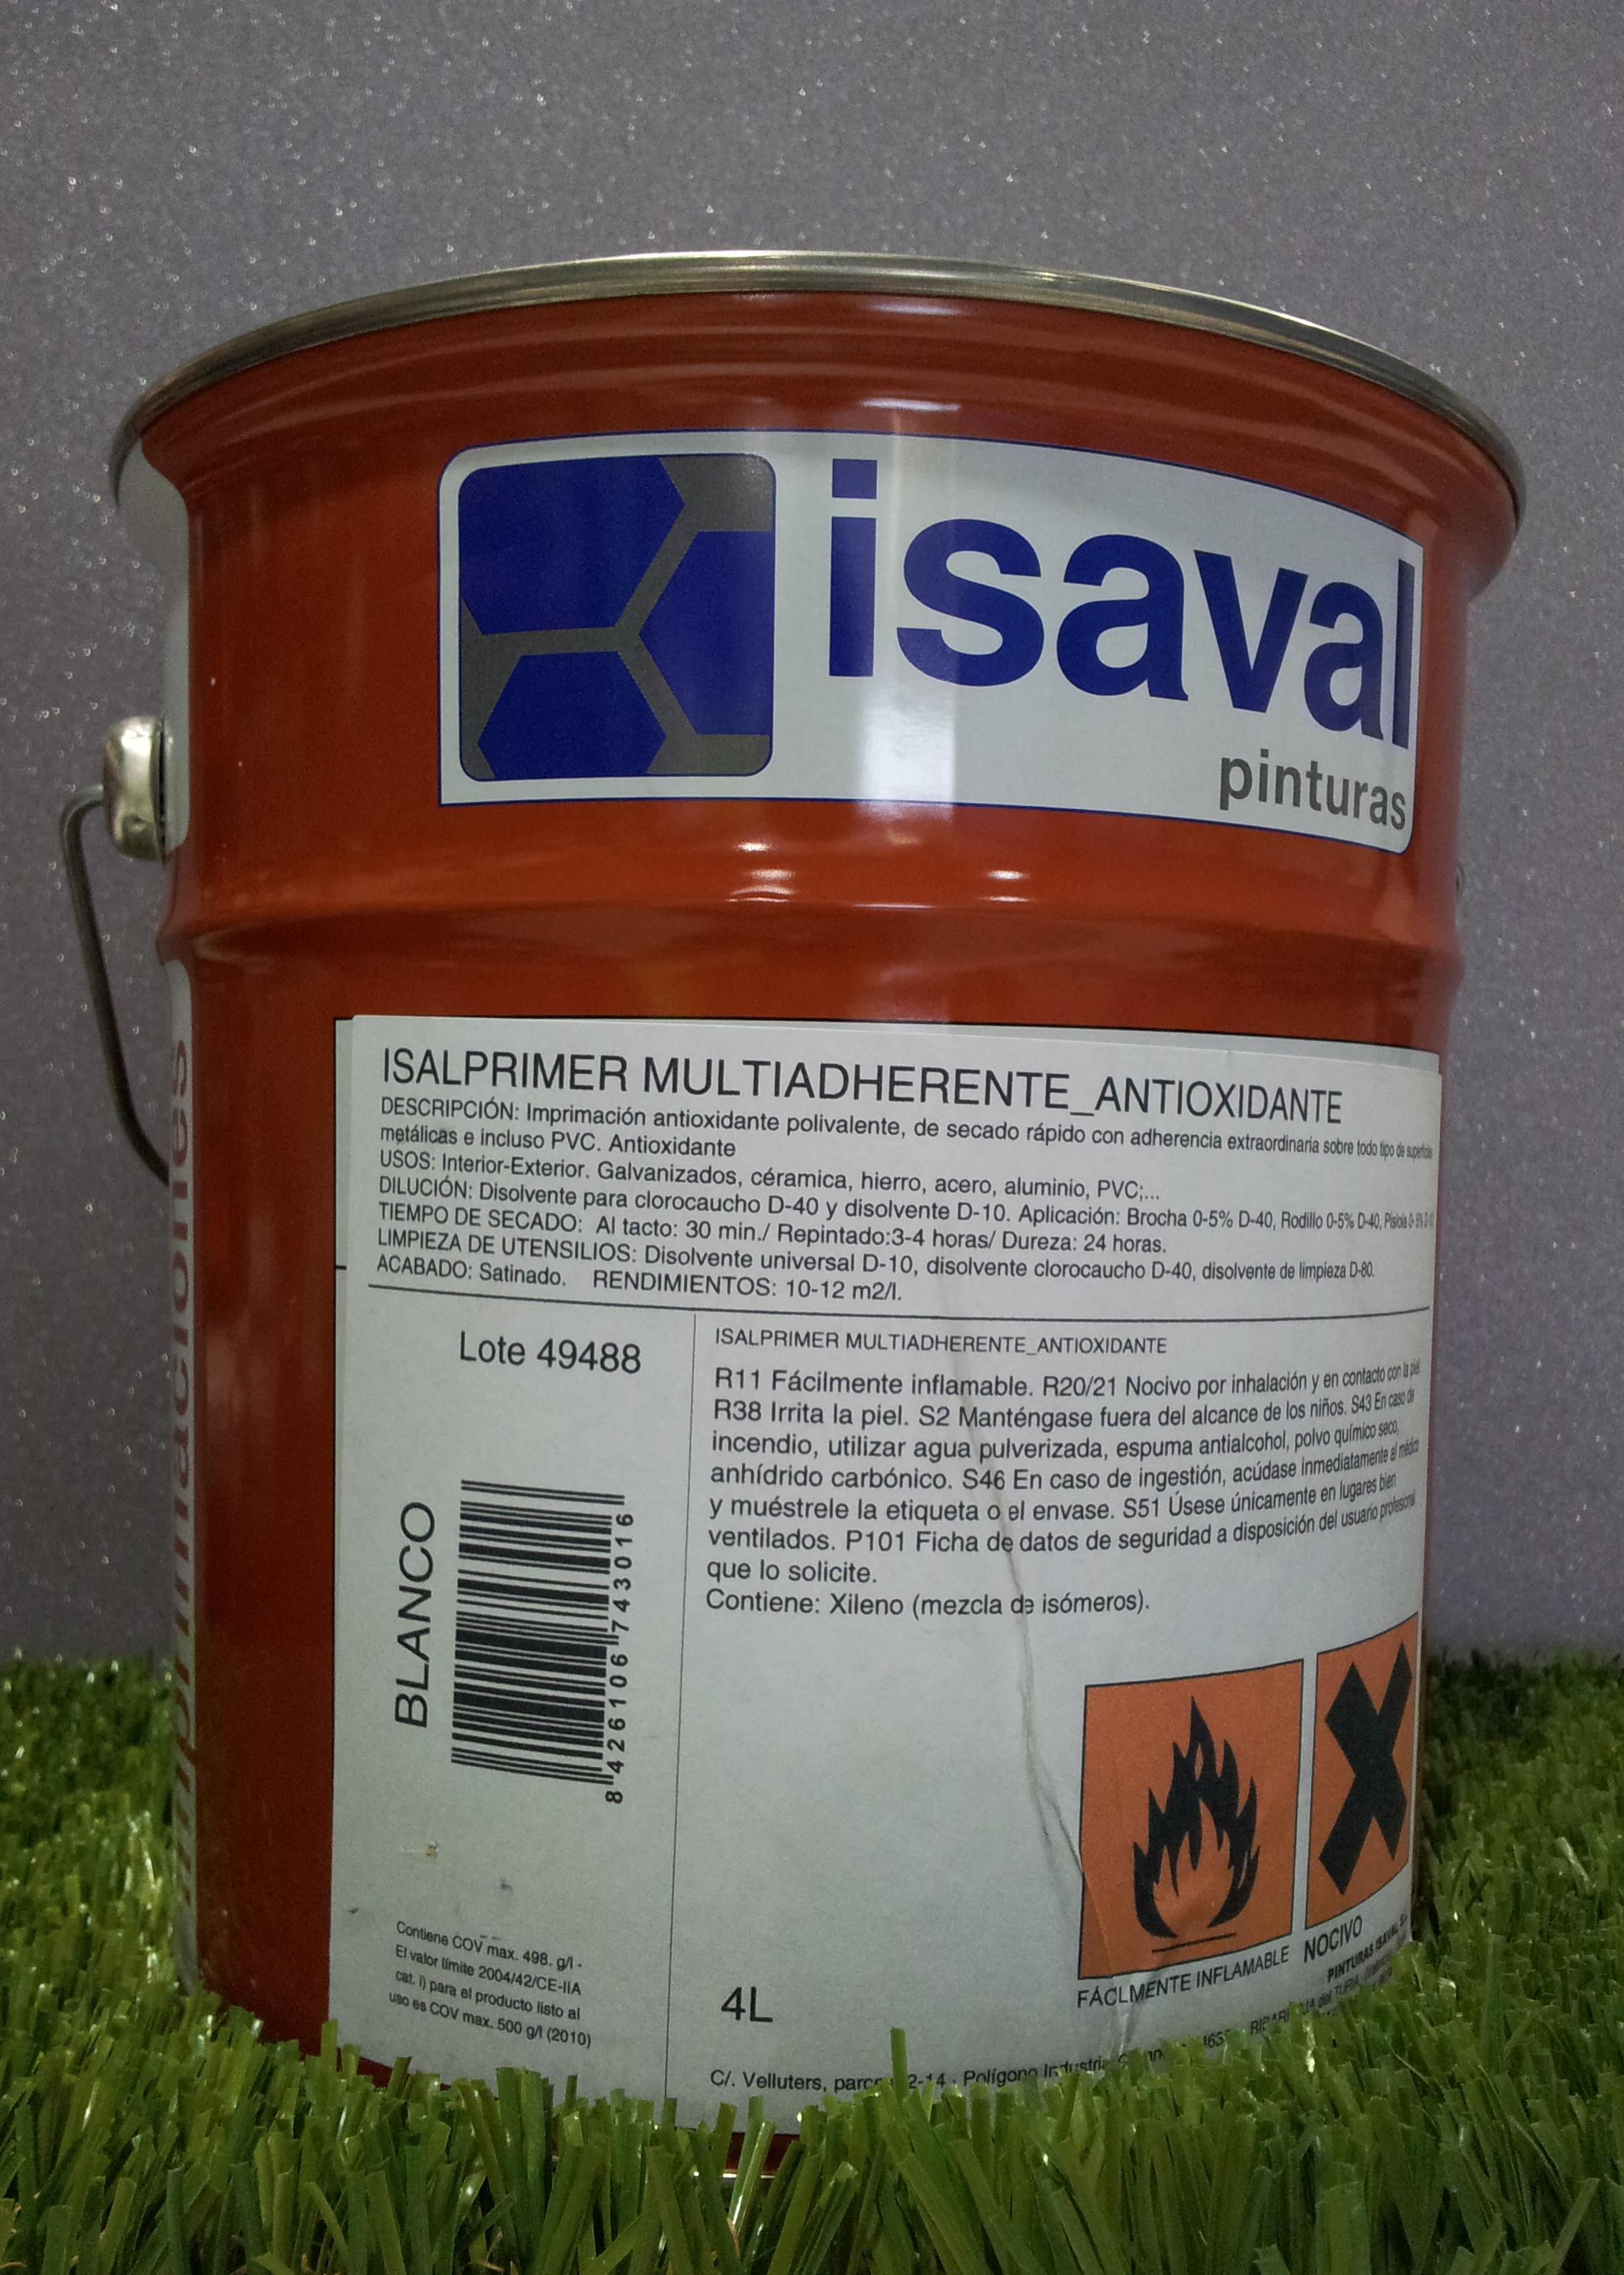 Imprimación Multiadherente ISAVAL Isalprimer Antioxidante